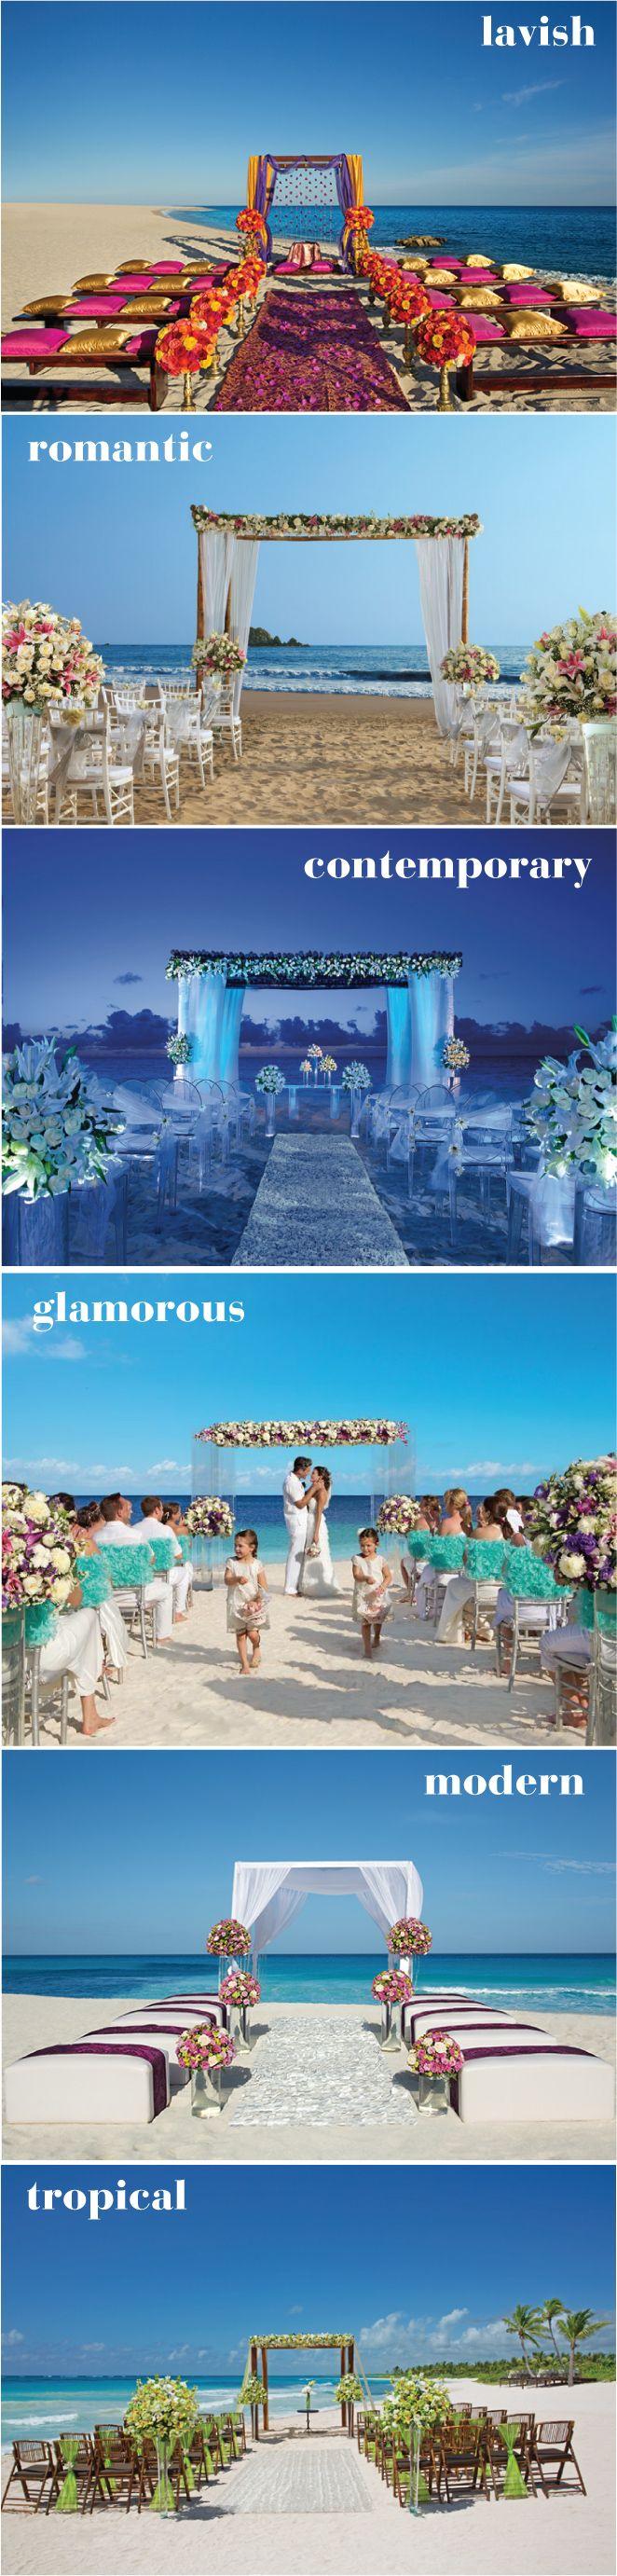 small beach wedding ceremony ideas%0A   Stealworthy beach  wedding ceremonies